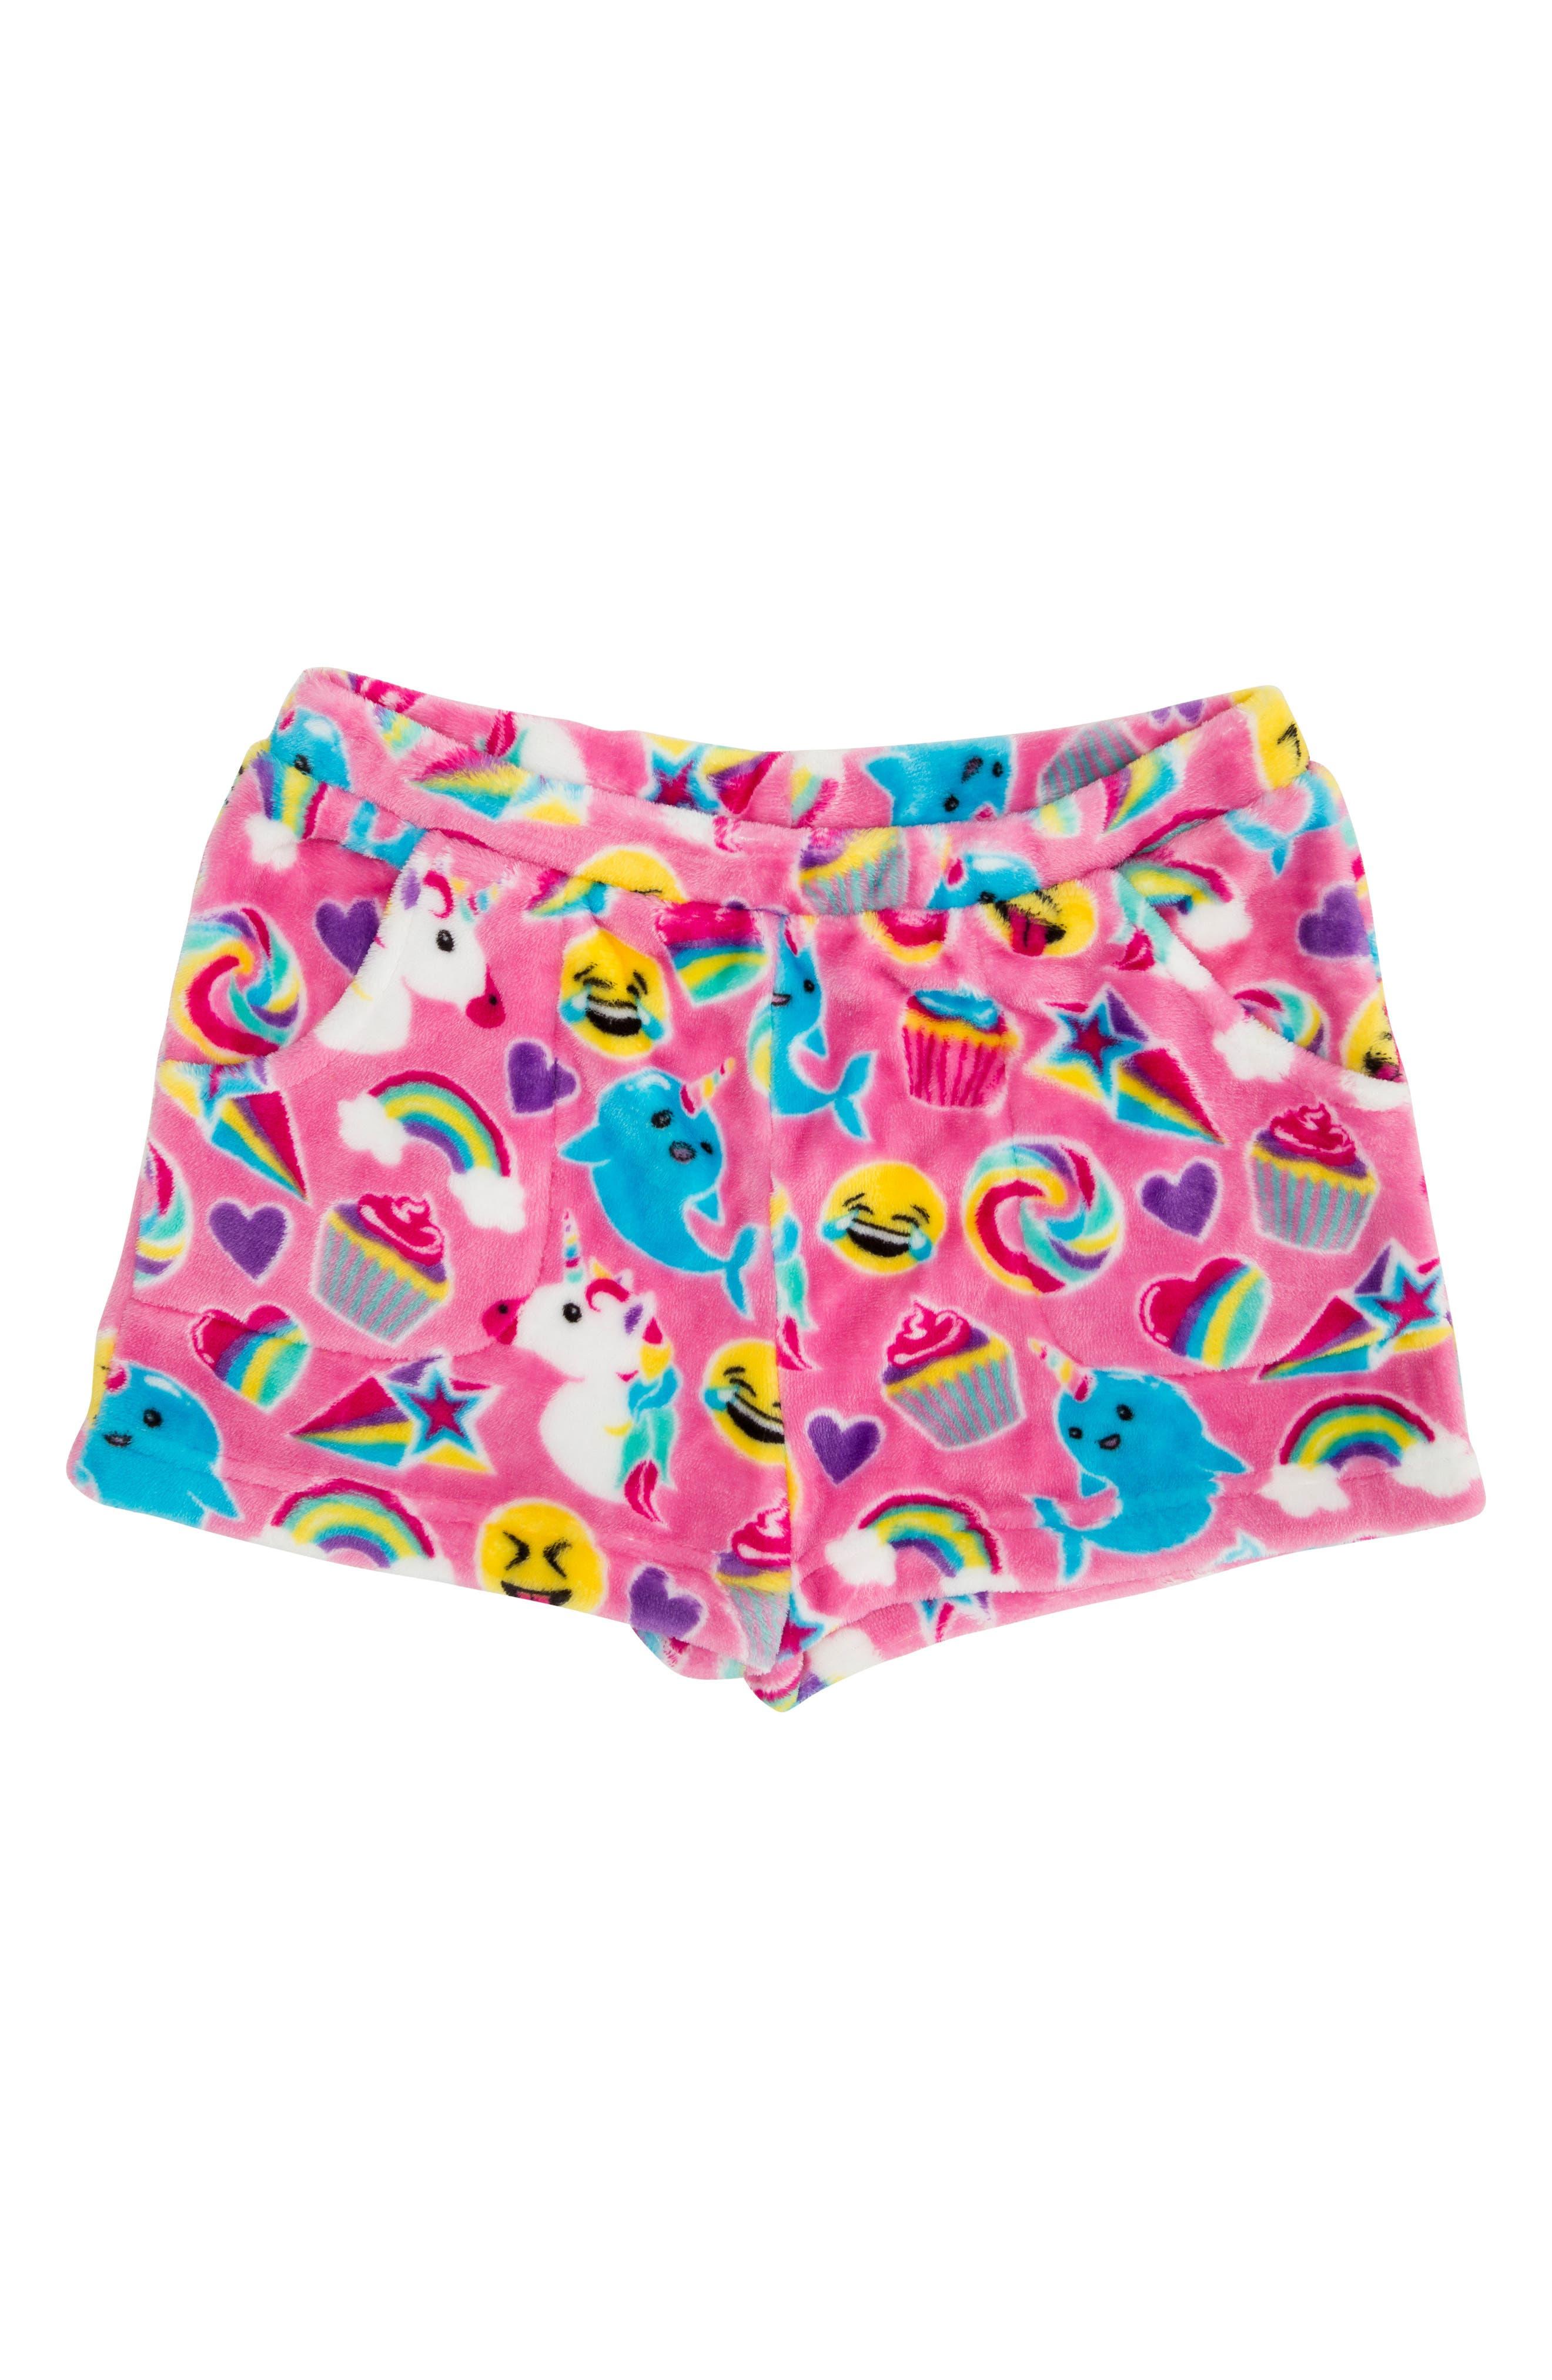 Emoji Fleece Pajama Shorts,                             Main thumbnail 1, color,                             650